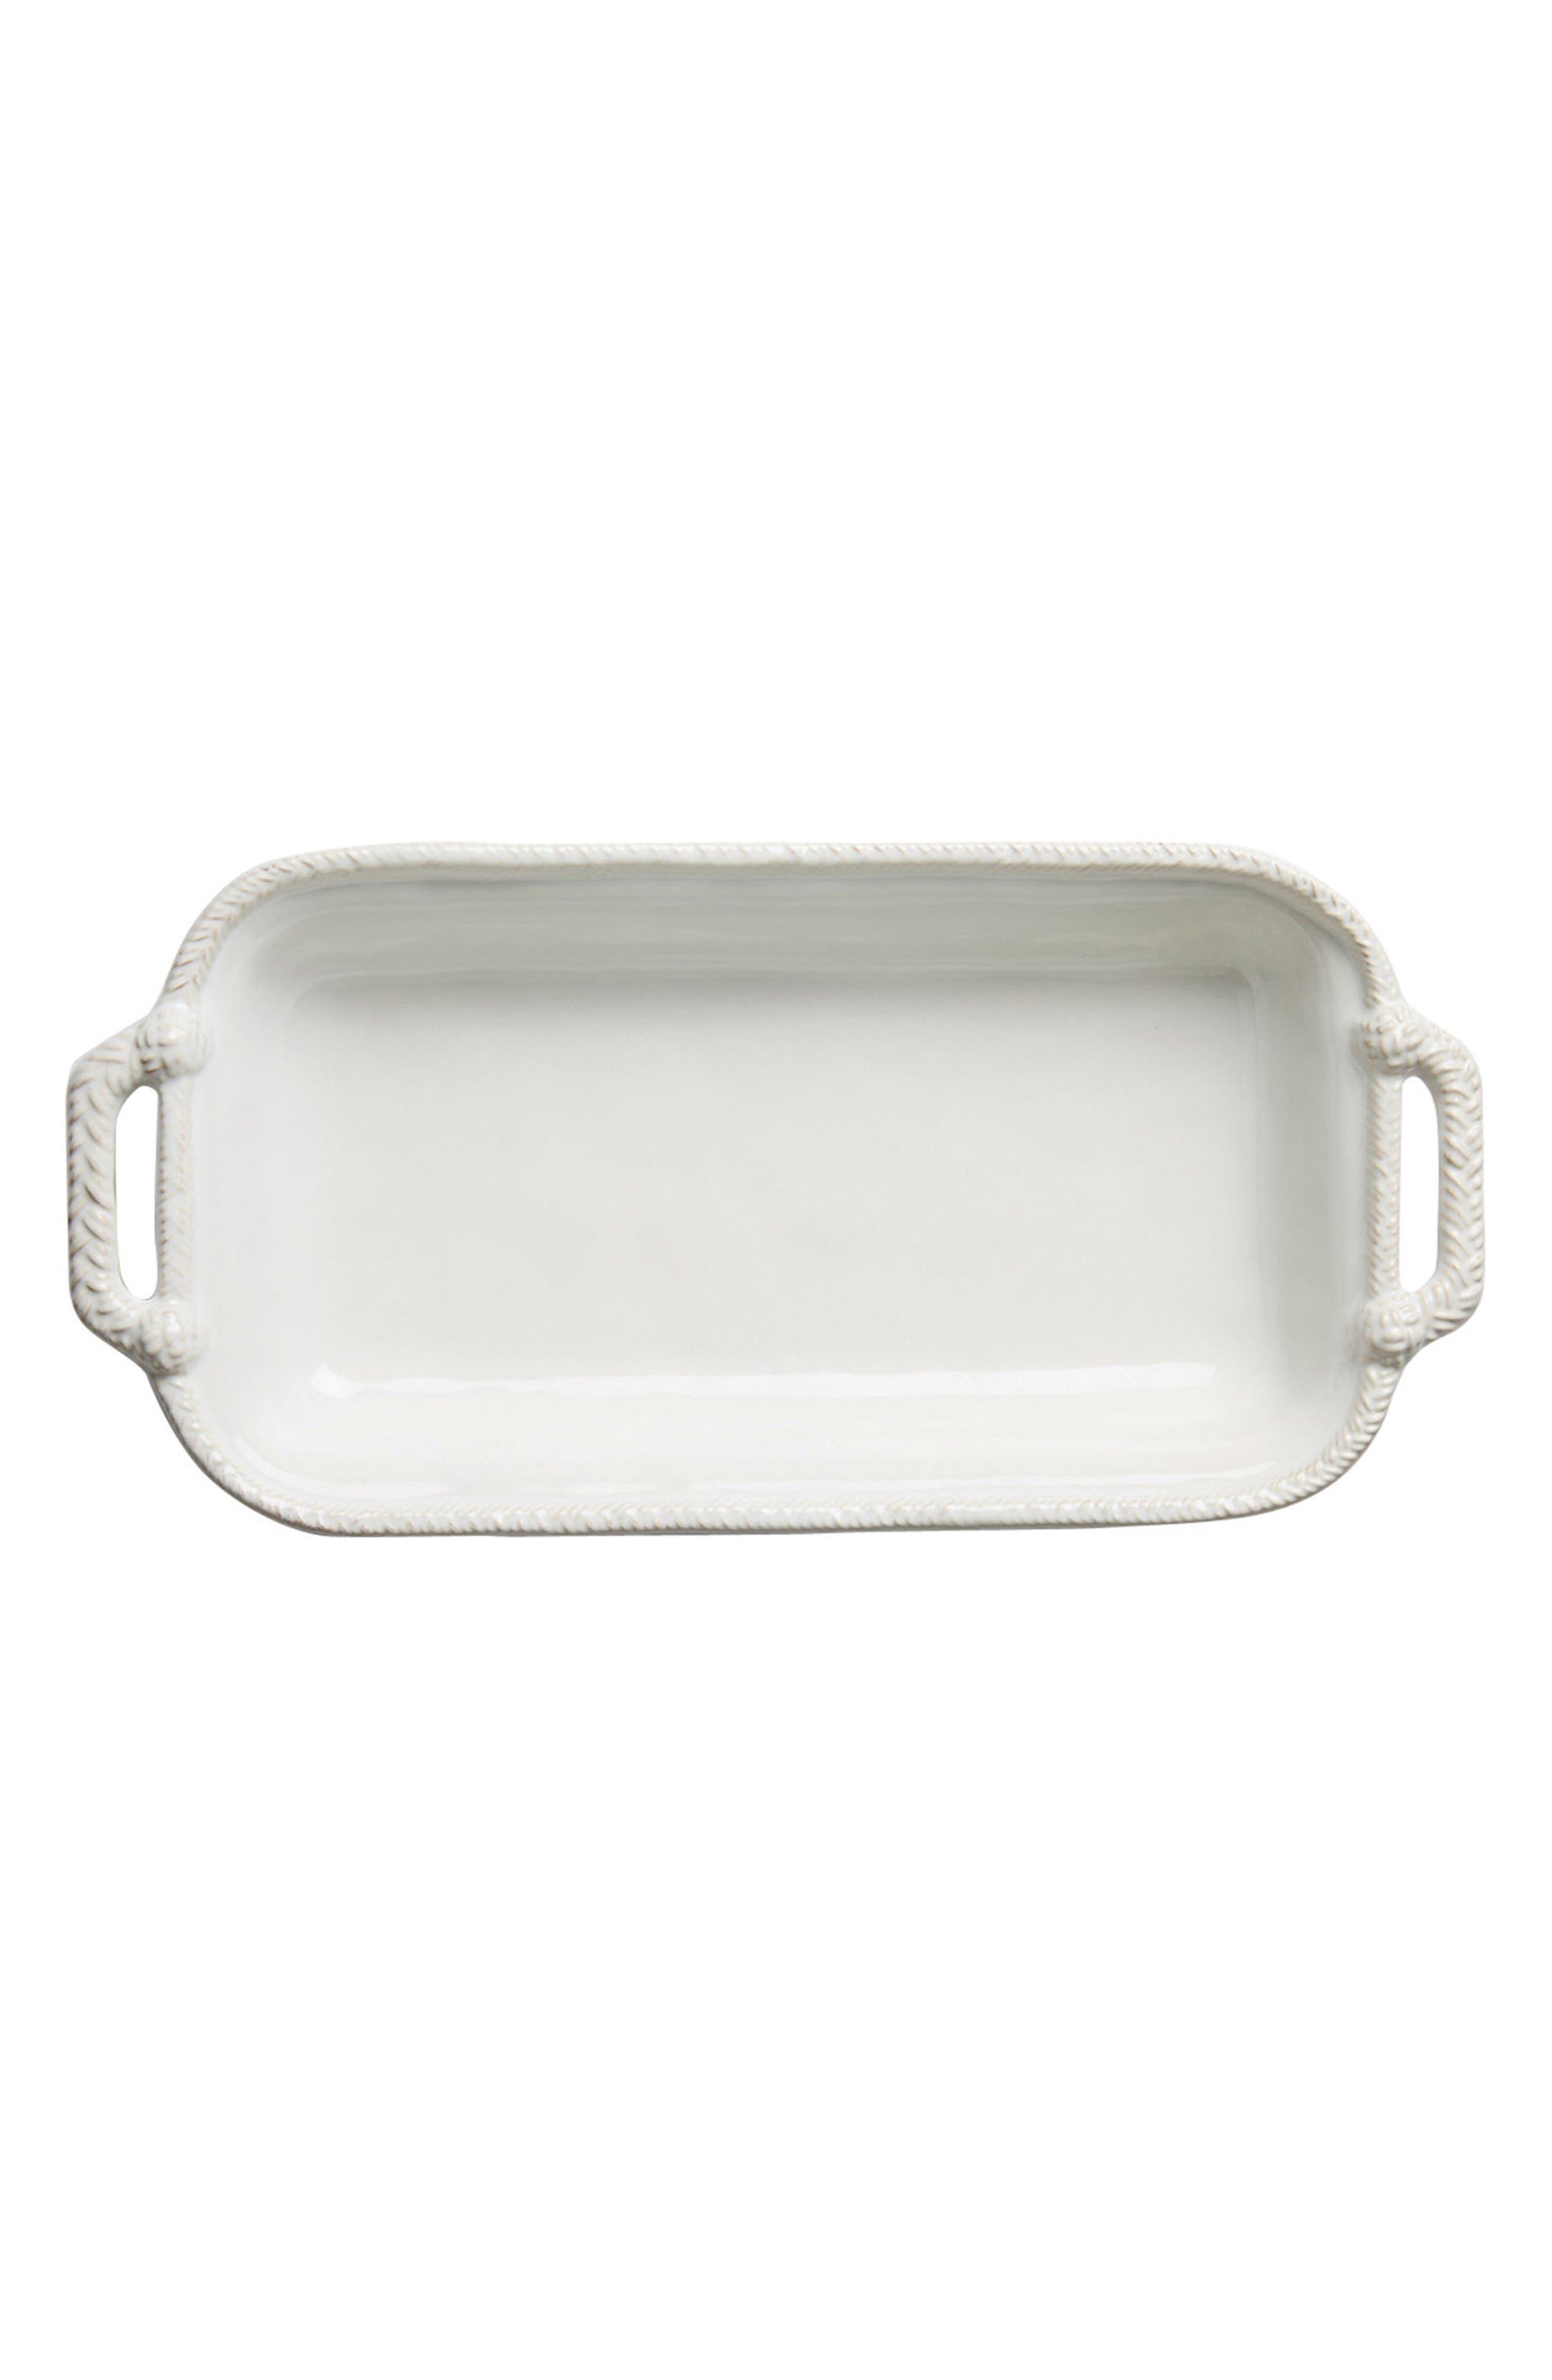 Le Panier 2-Quart Rectangular Baking Dish,                         Main,                         color, Whitewash